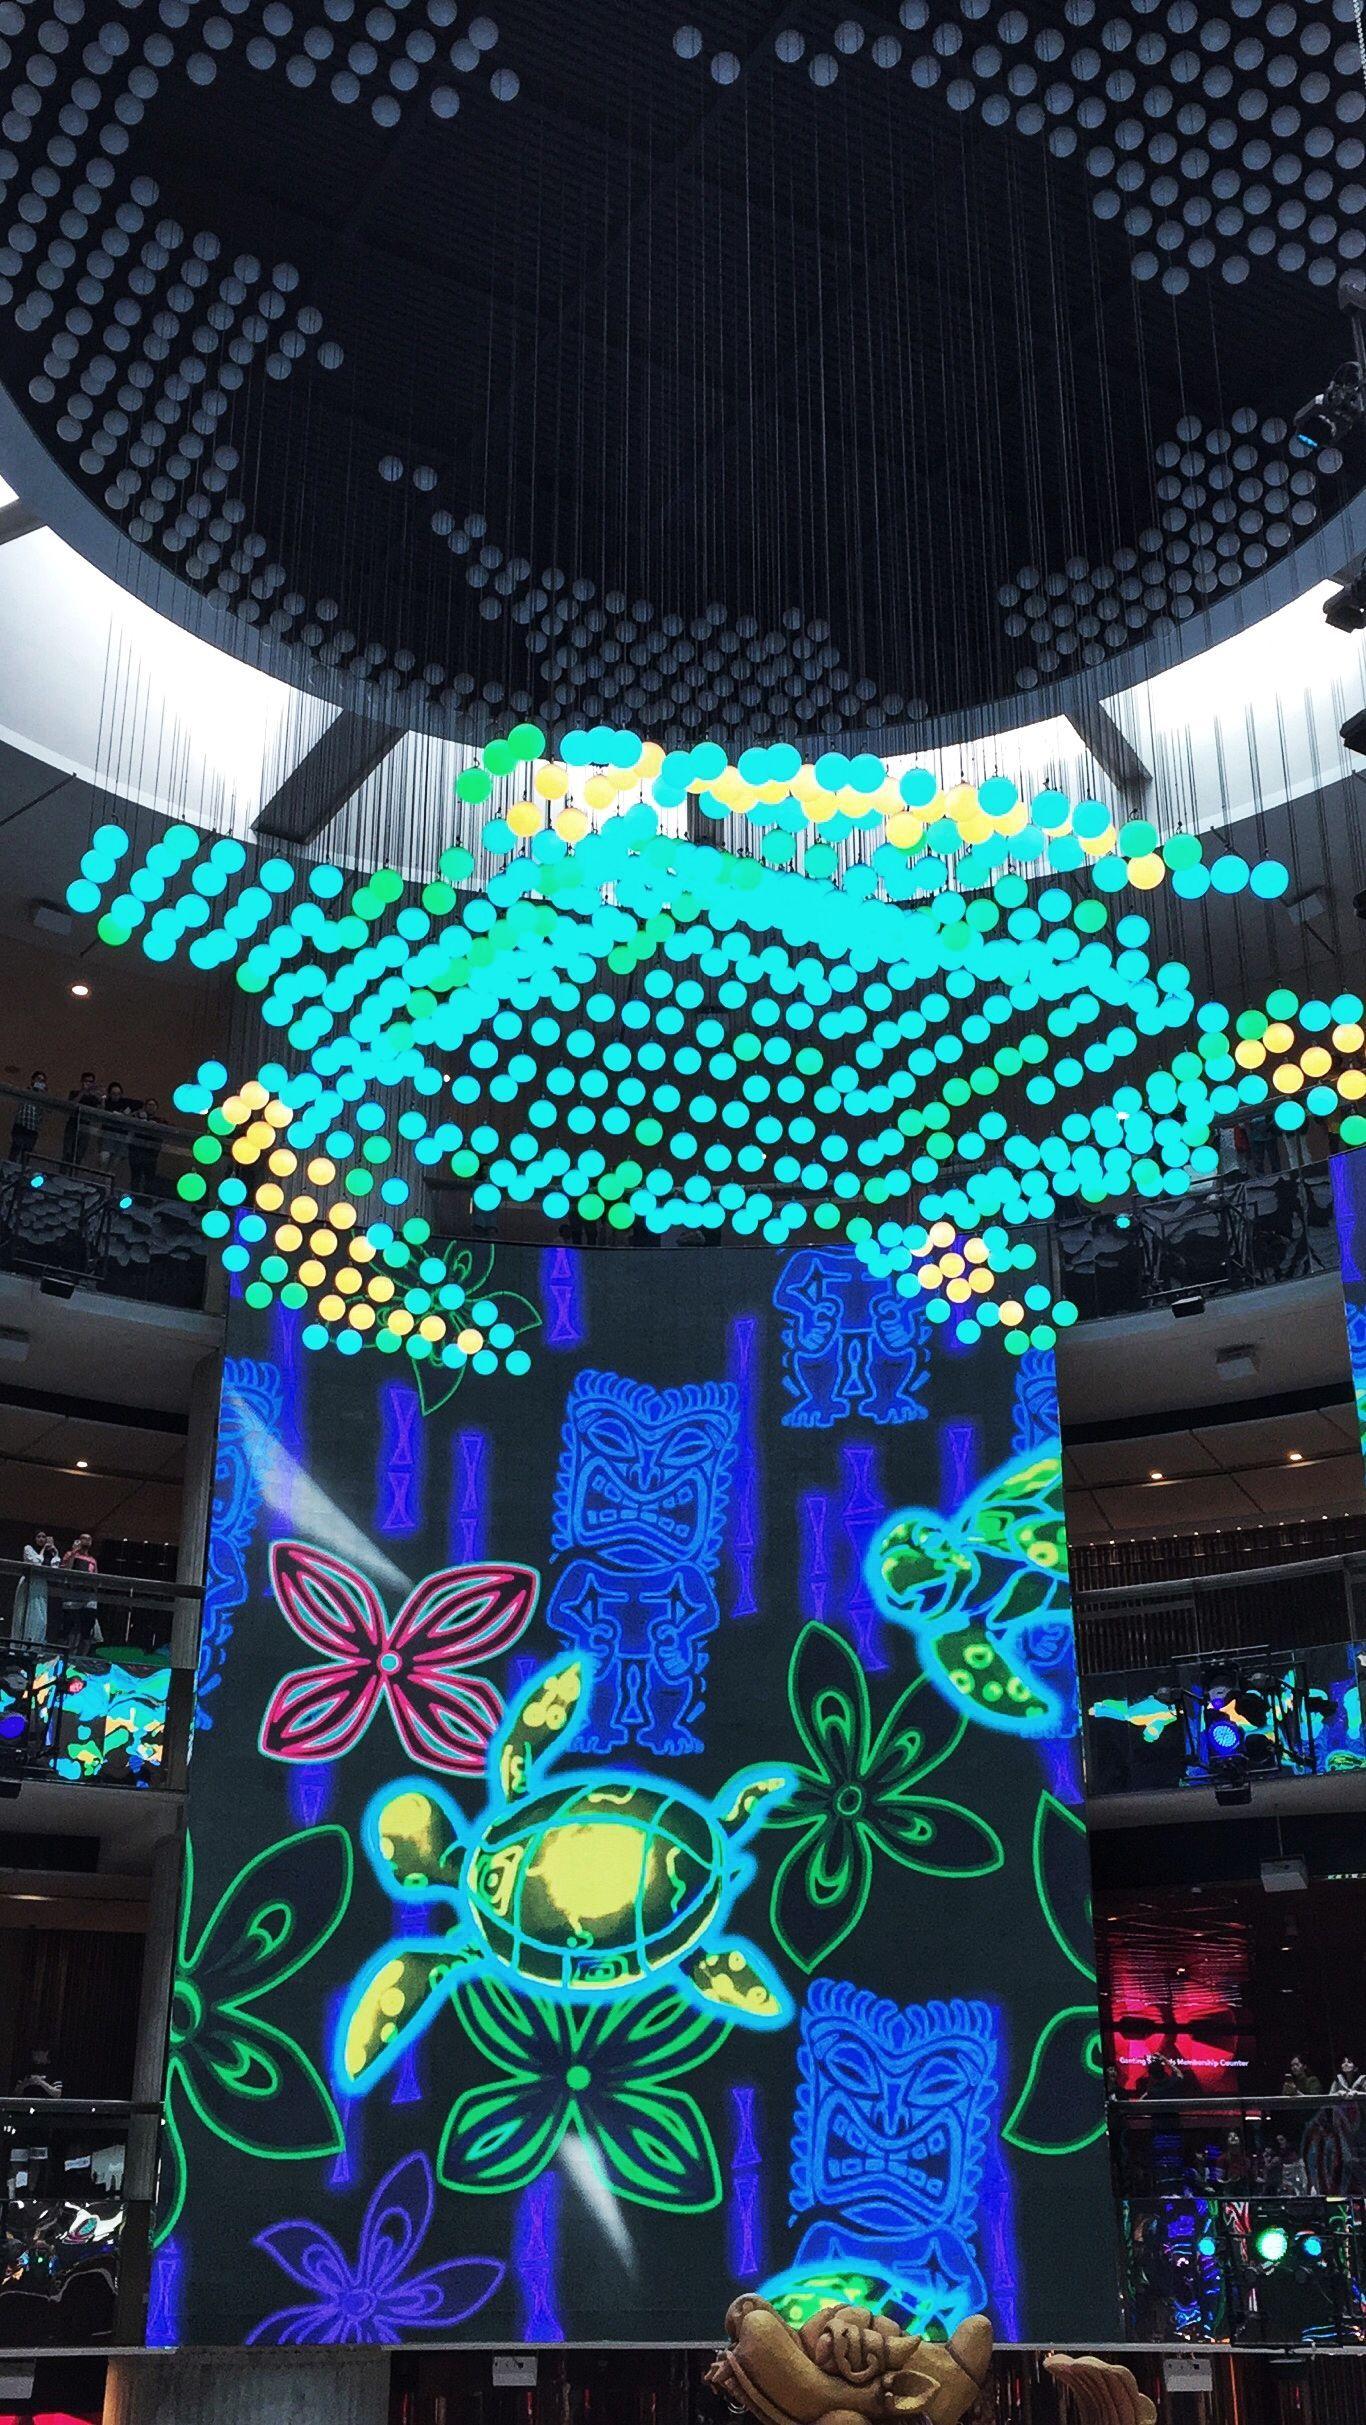 Wisata Menantang Sekaligus Seru di Resort World Genting Malaysia